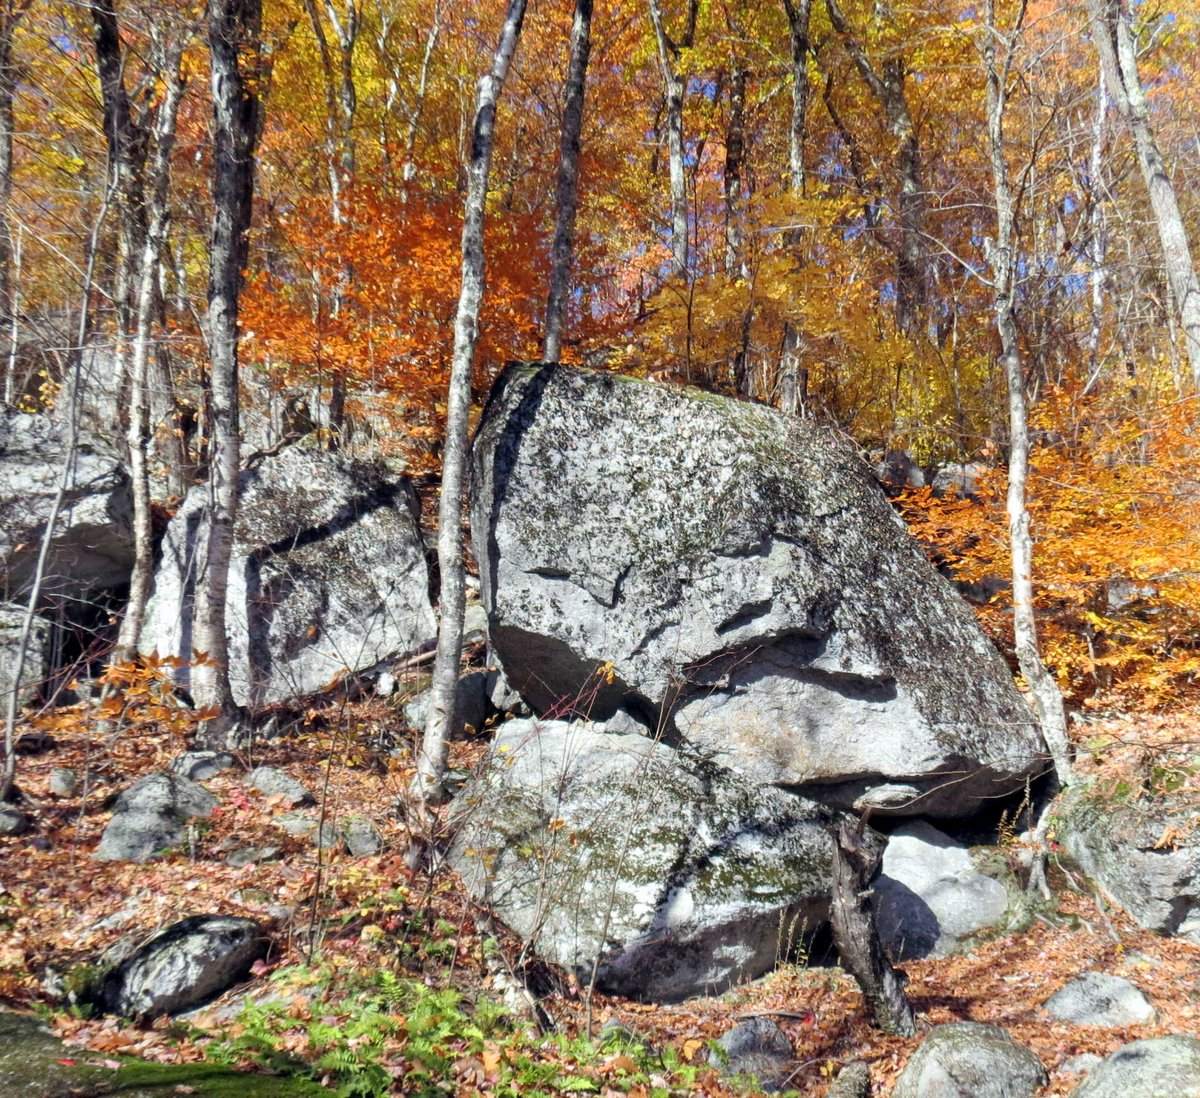 8. Boulder Fall